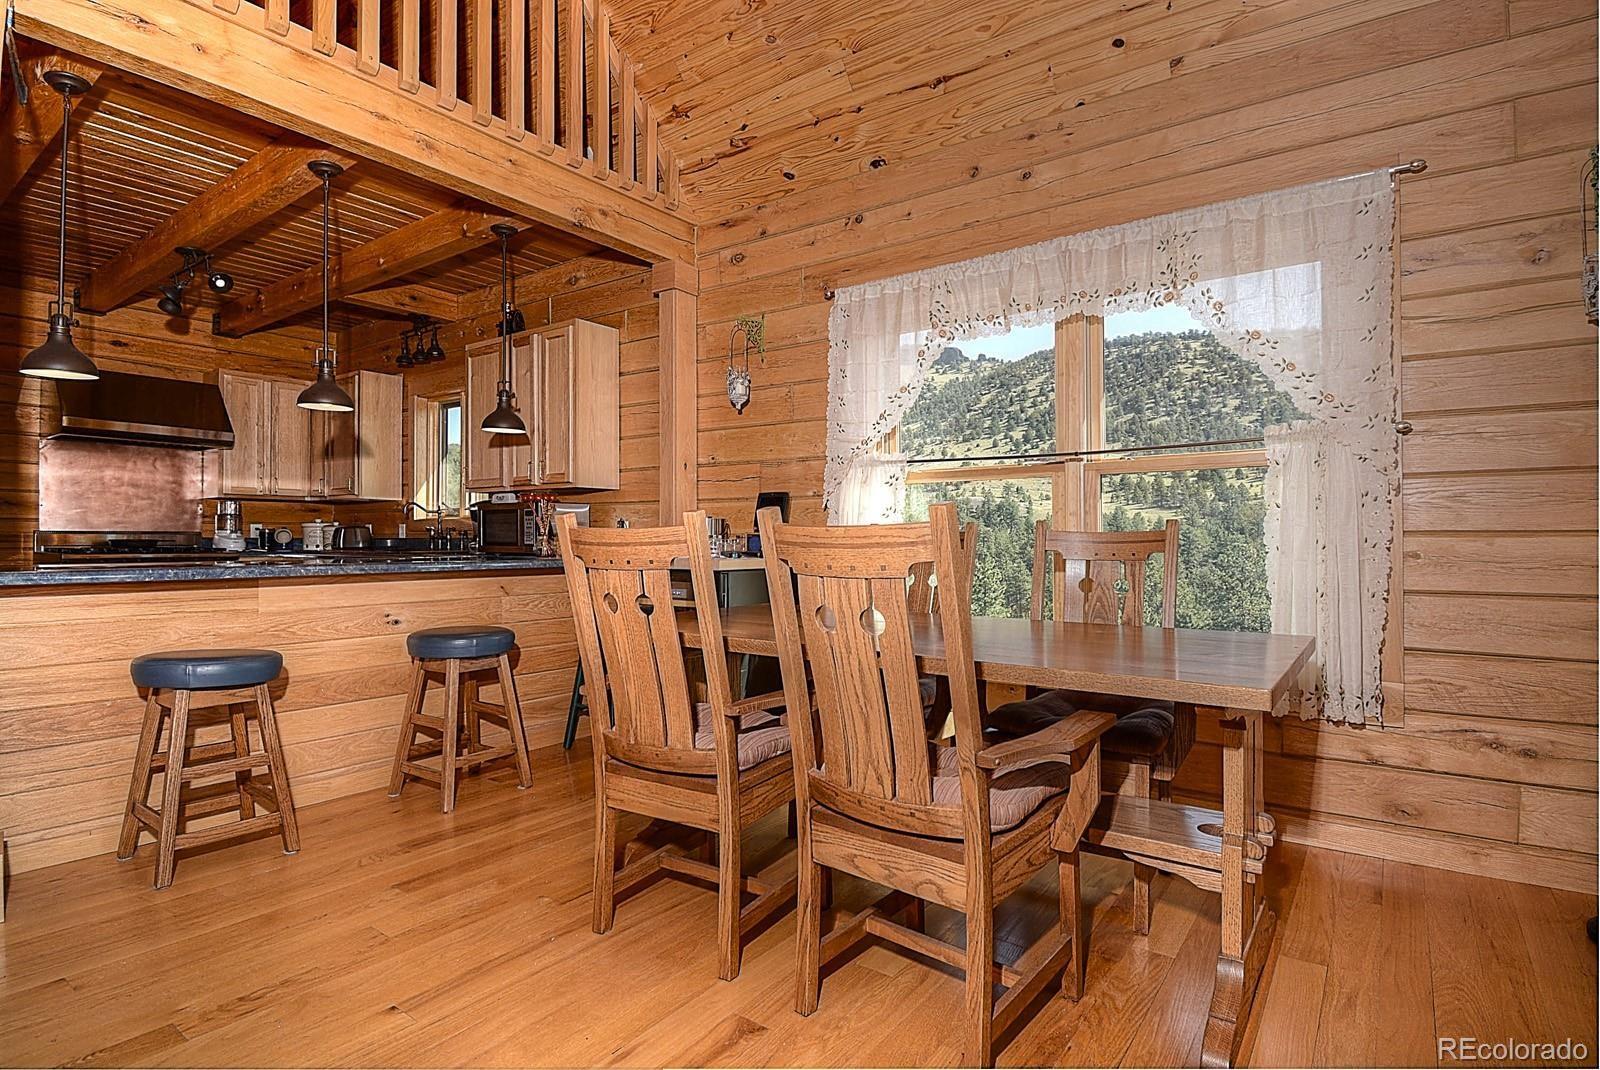 MLS# 8182693 - 13 - 396 Eagle Nest Trail, Guffey, CO 80820